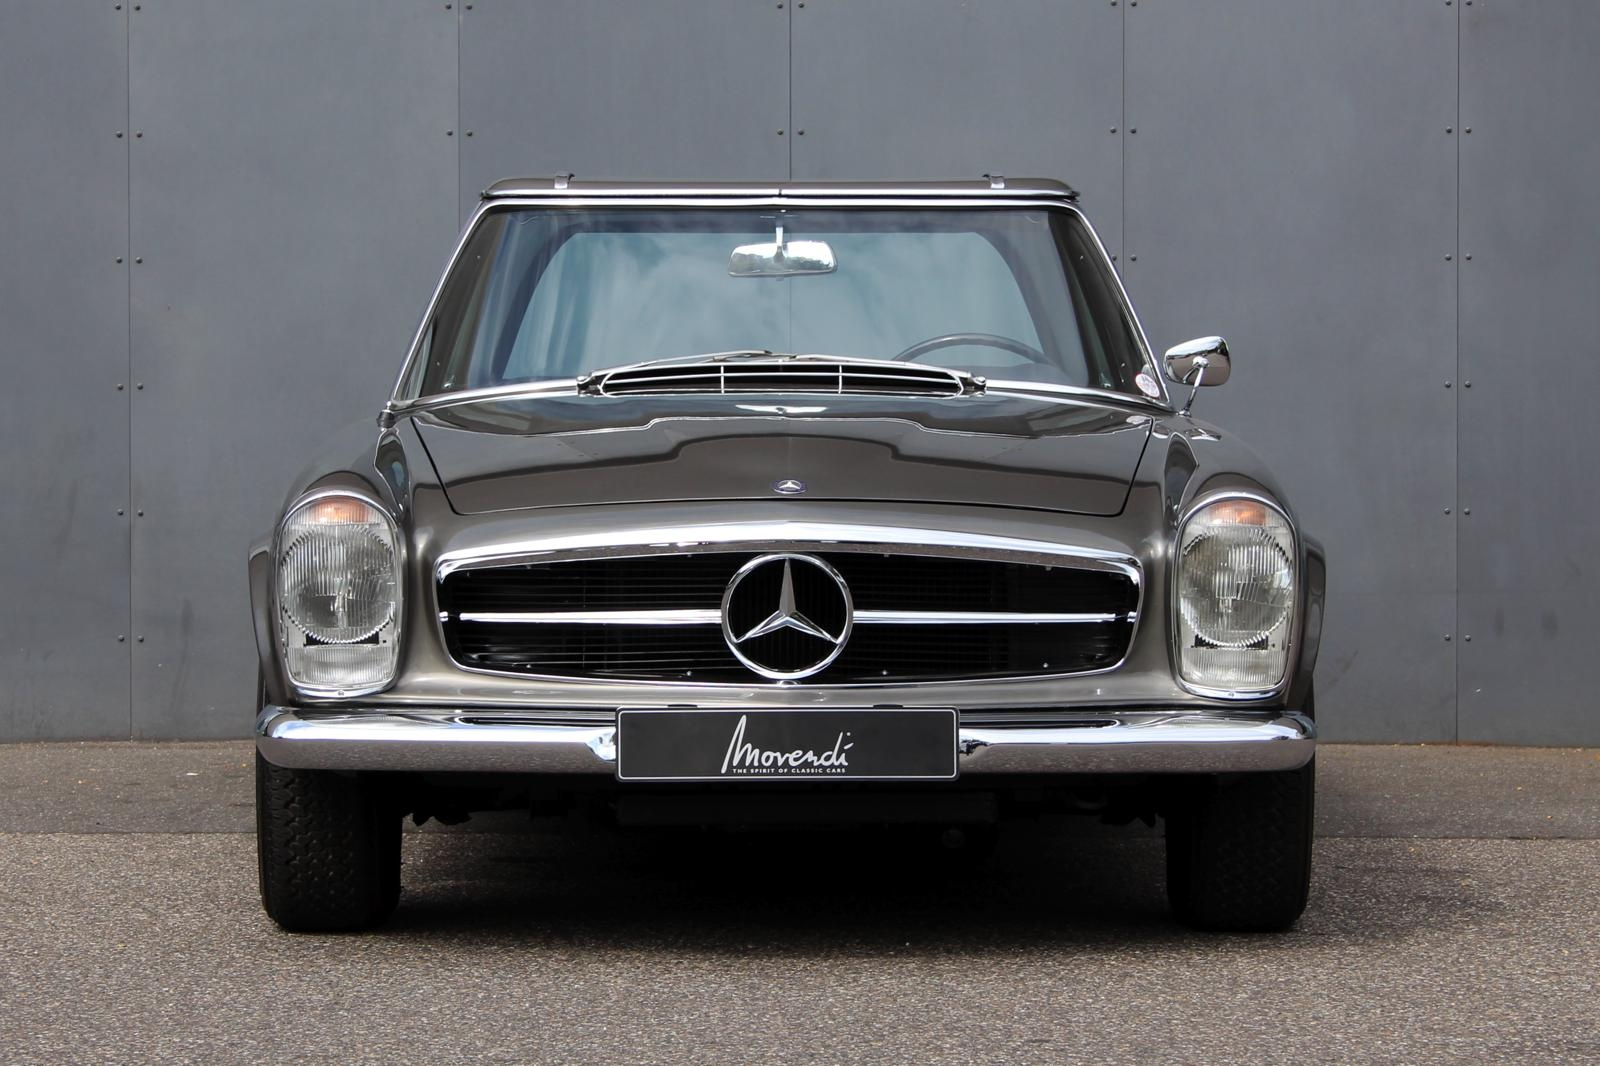 https://www.classicdriver.com/sites/default/files/cars_images/img_1960mercedes_230_sl__1.jpg